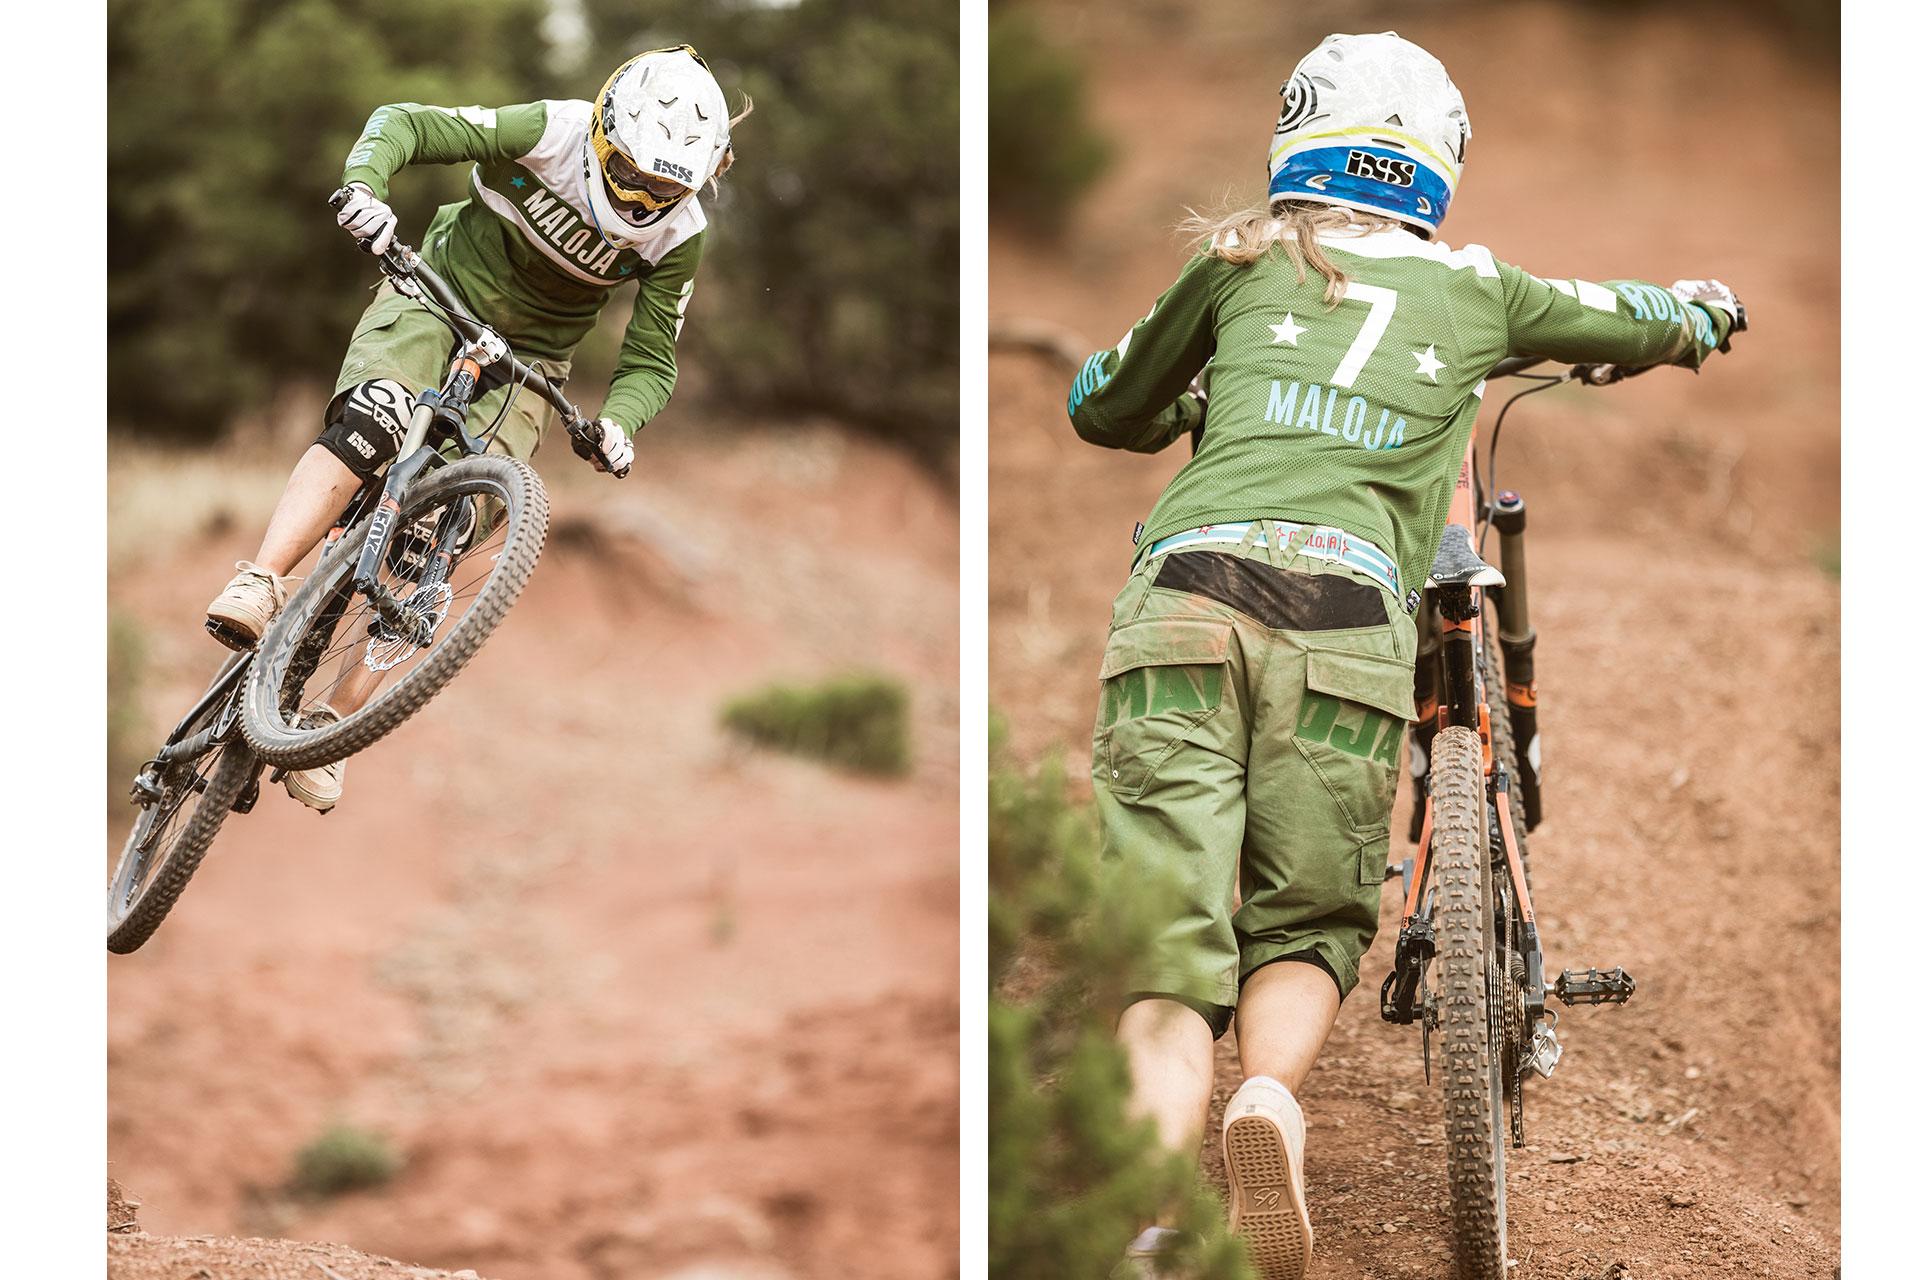 Freeride Fotograf Sport Outdoor Maloja Katalog Mountainbike Aktion München Deutschland